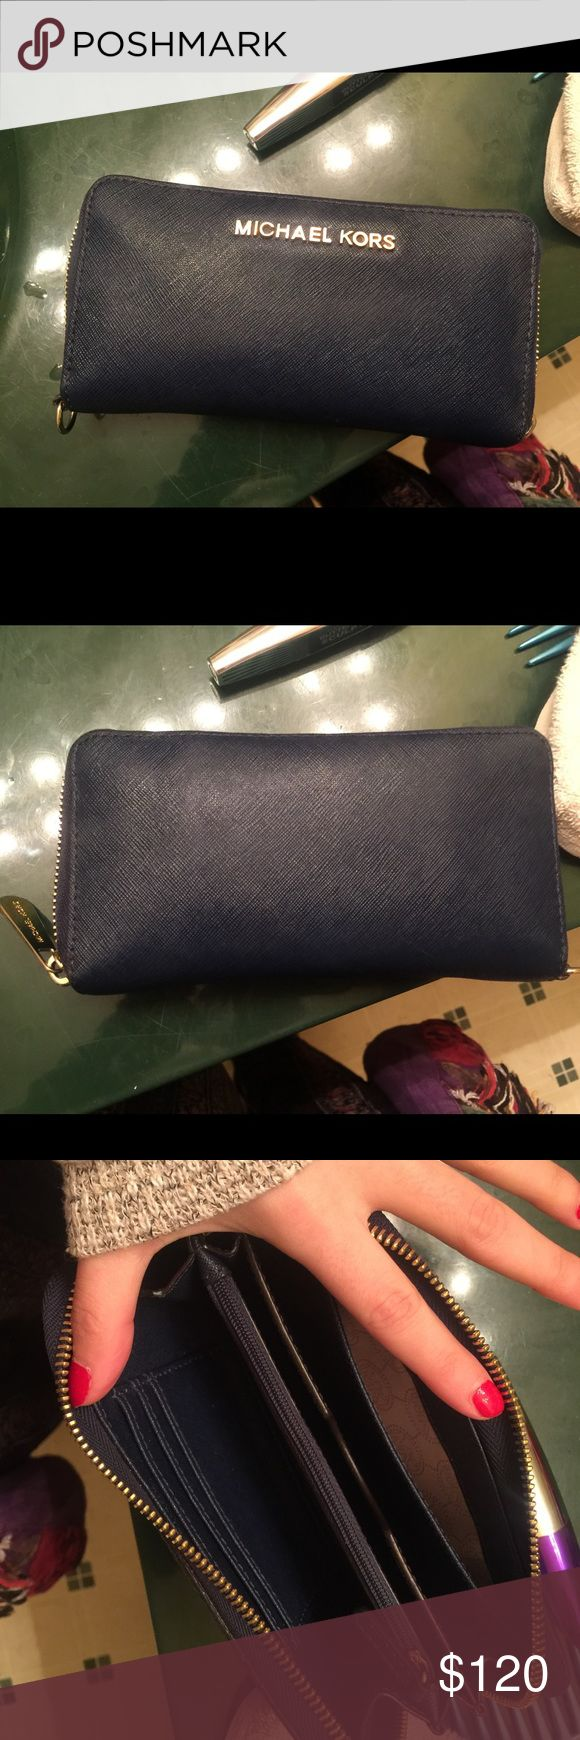 Jet Set Michael Kors wallet Navy blue, gently used Michael Kors jet set wallet - more pics at request Michael Kors Bags Wallets